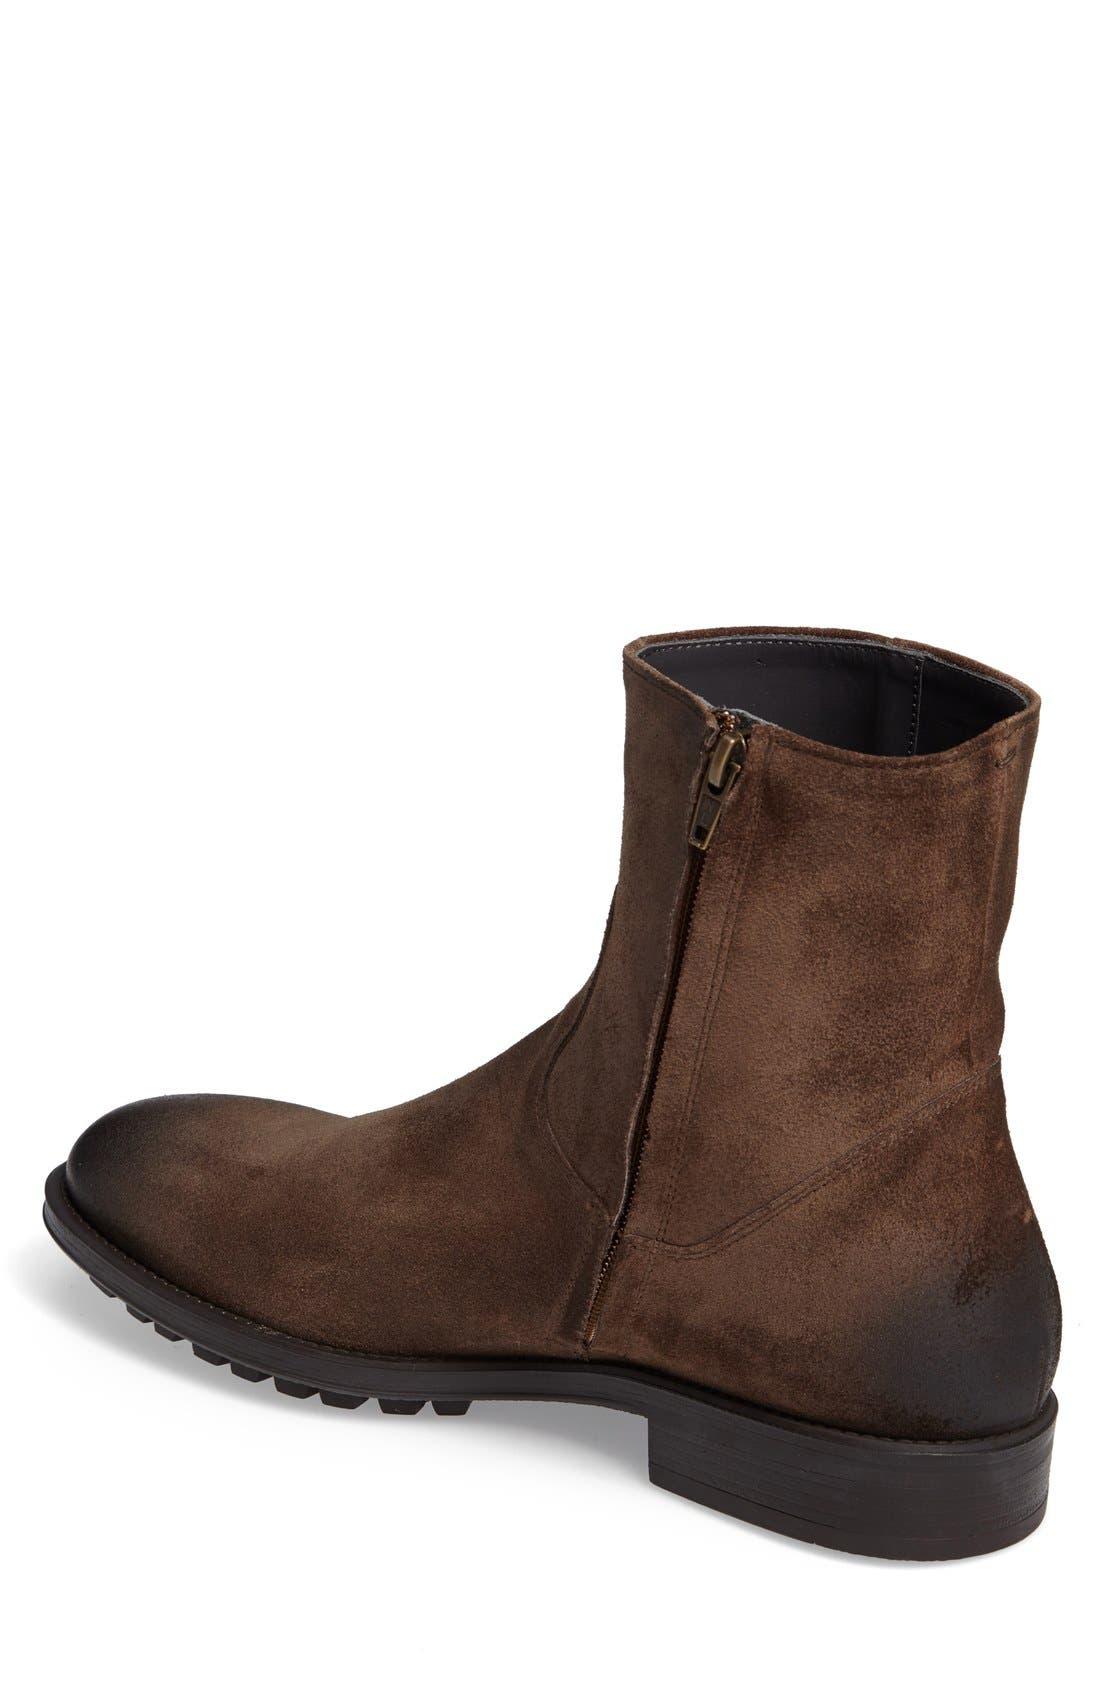 Alternate Image 2  - To Boot New York 'Harrison' Zip Boot (Men)